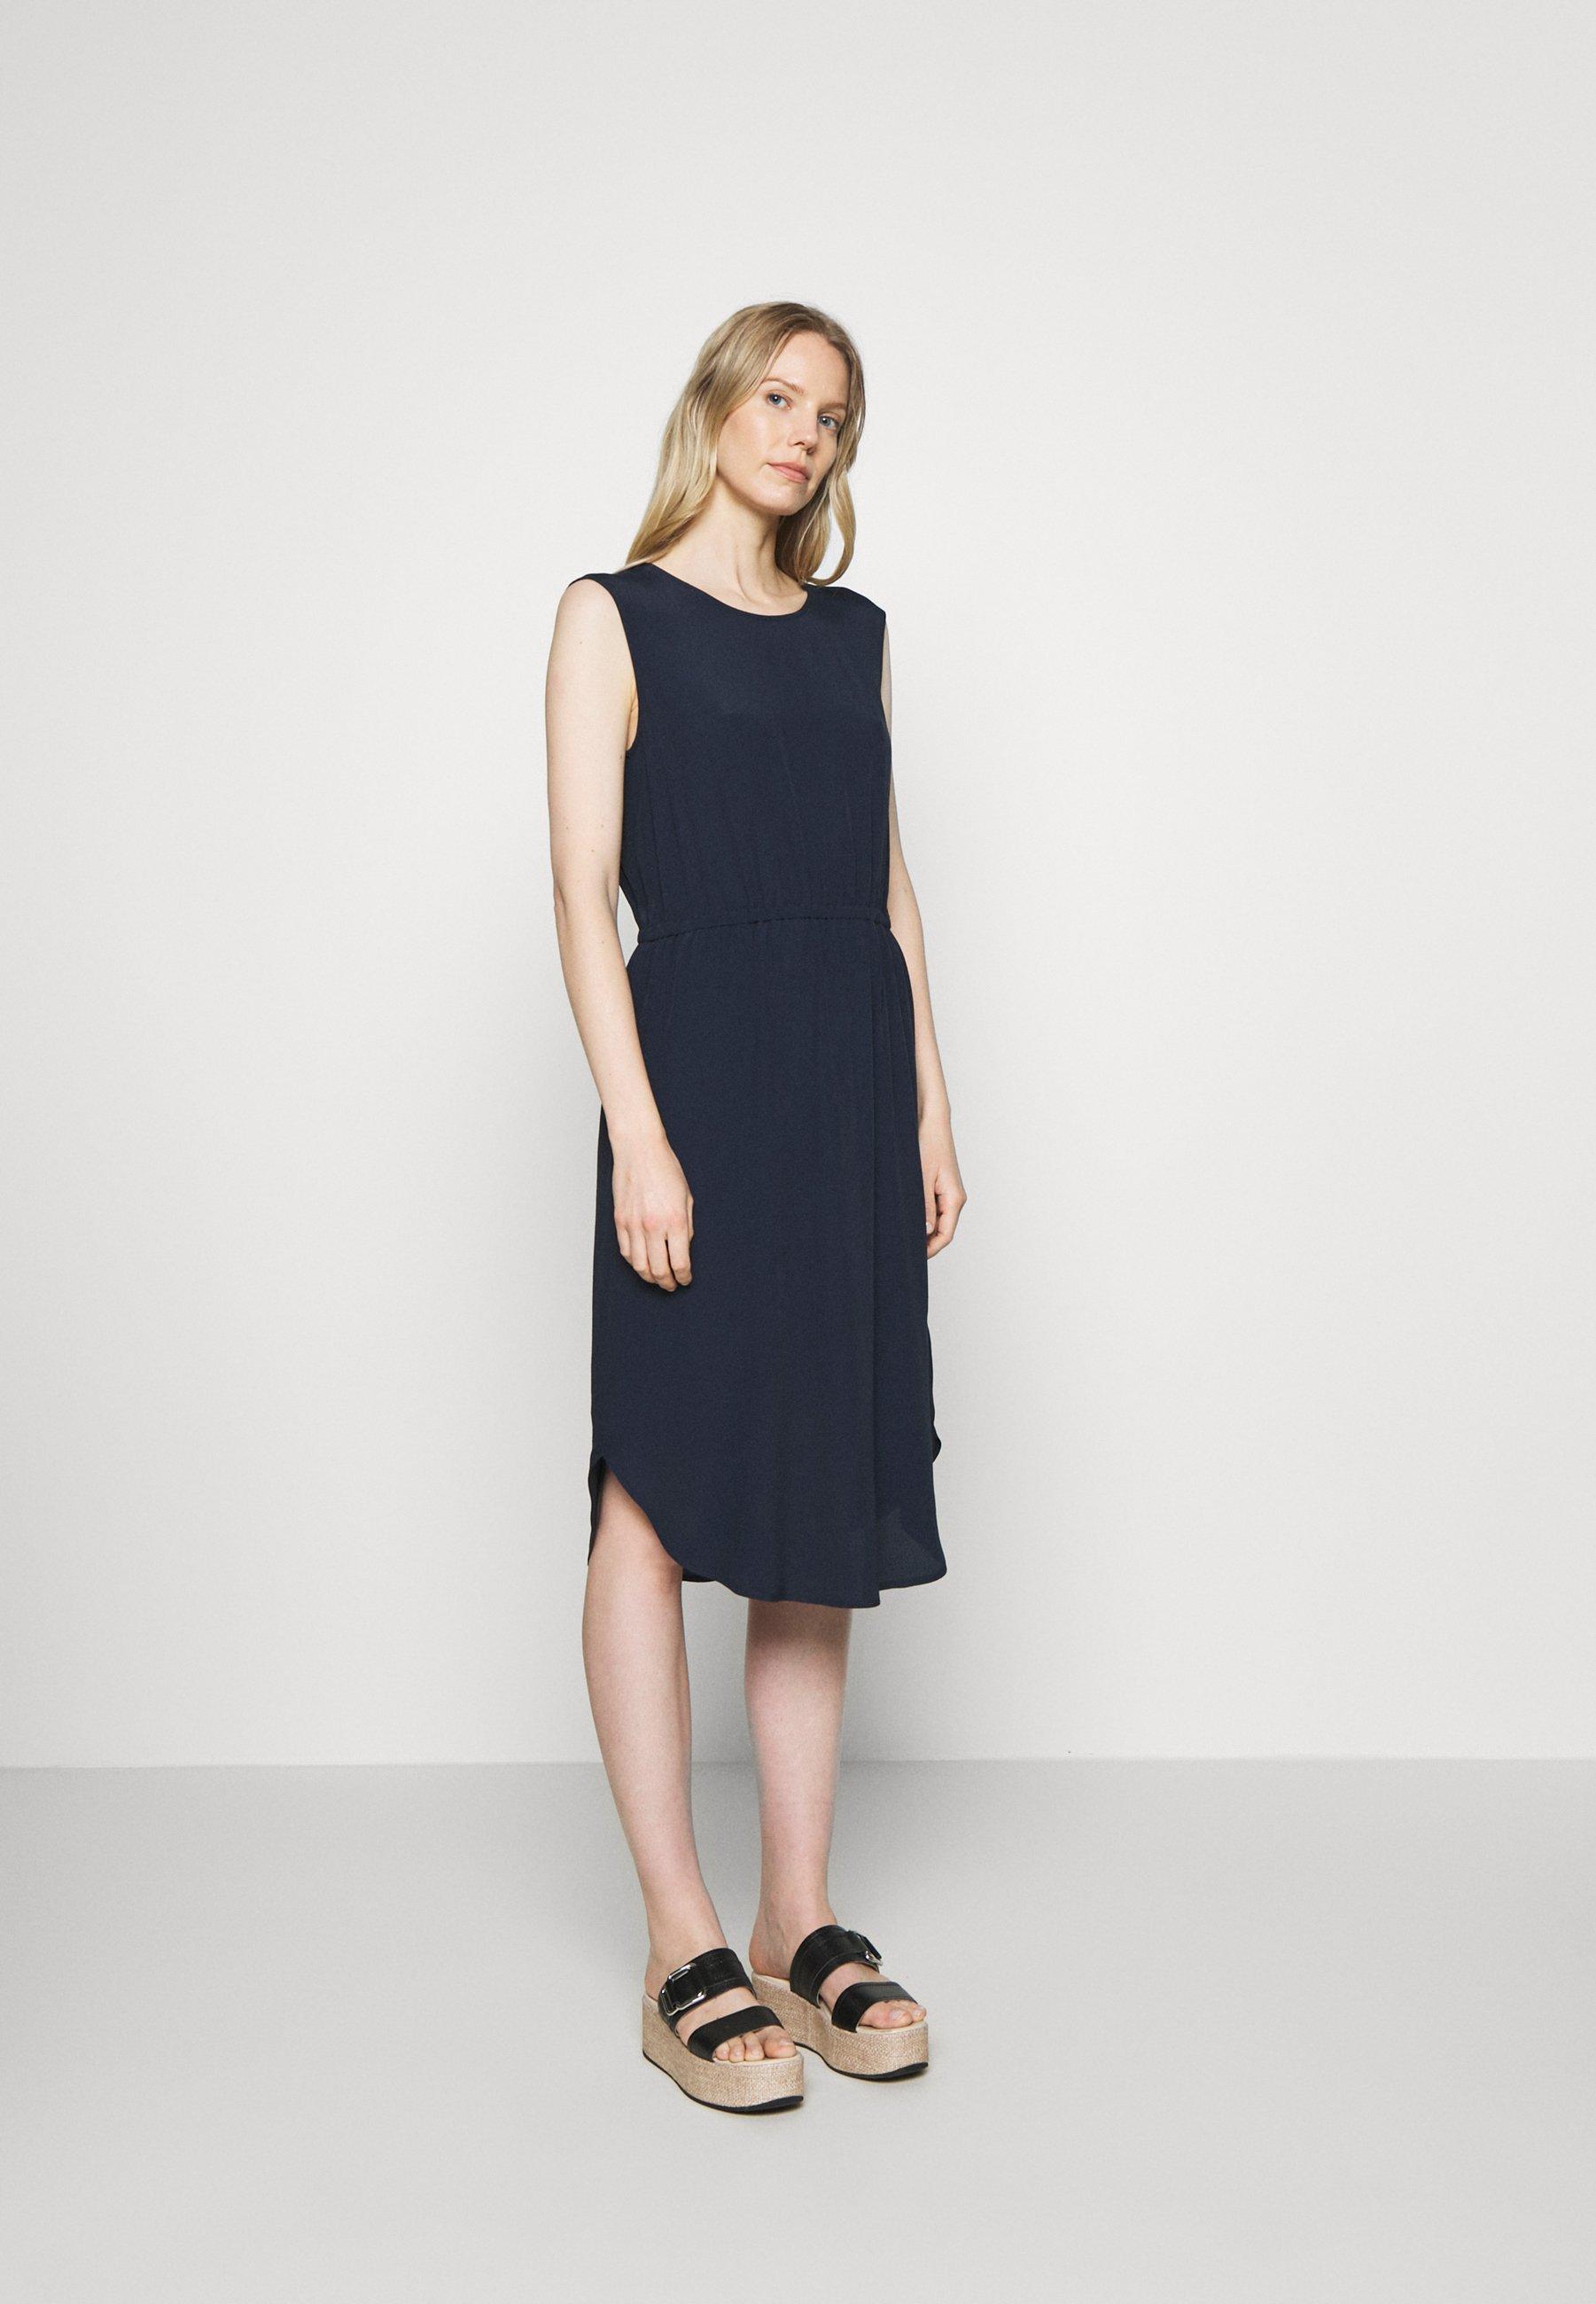 Official Women's Clothing Marc O'Polo DENIM DRESS STRAP DETAIL AT BACK Day dress scandinavian blue uq9v1NCrr